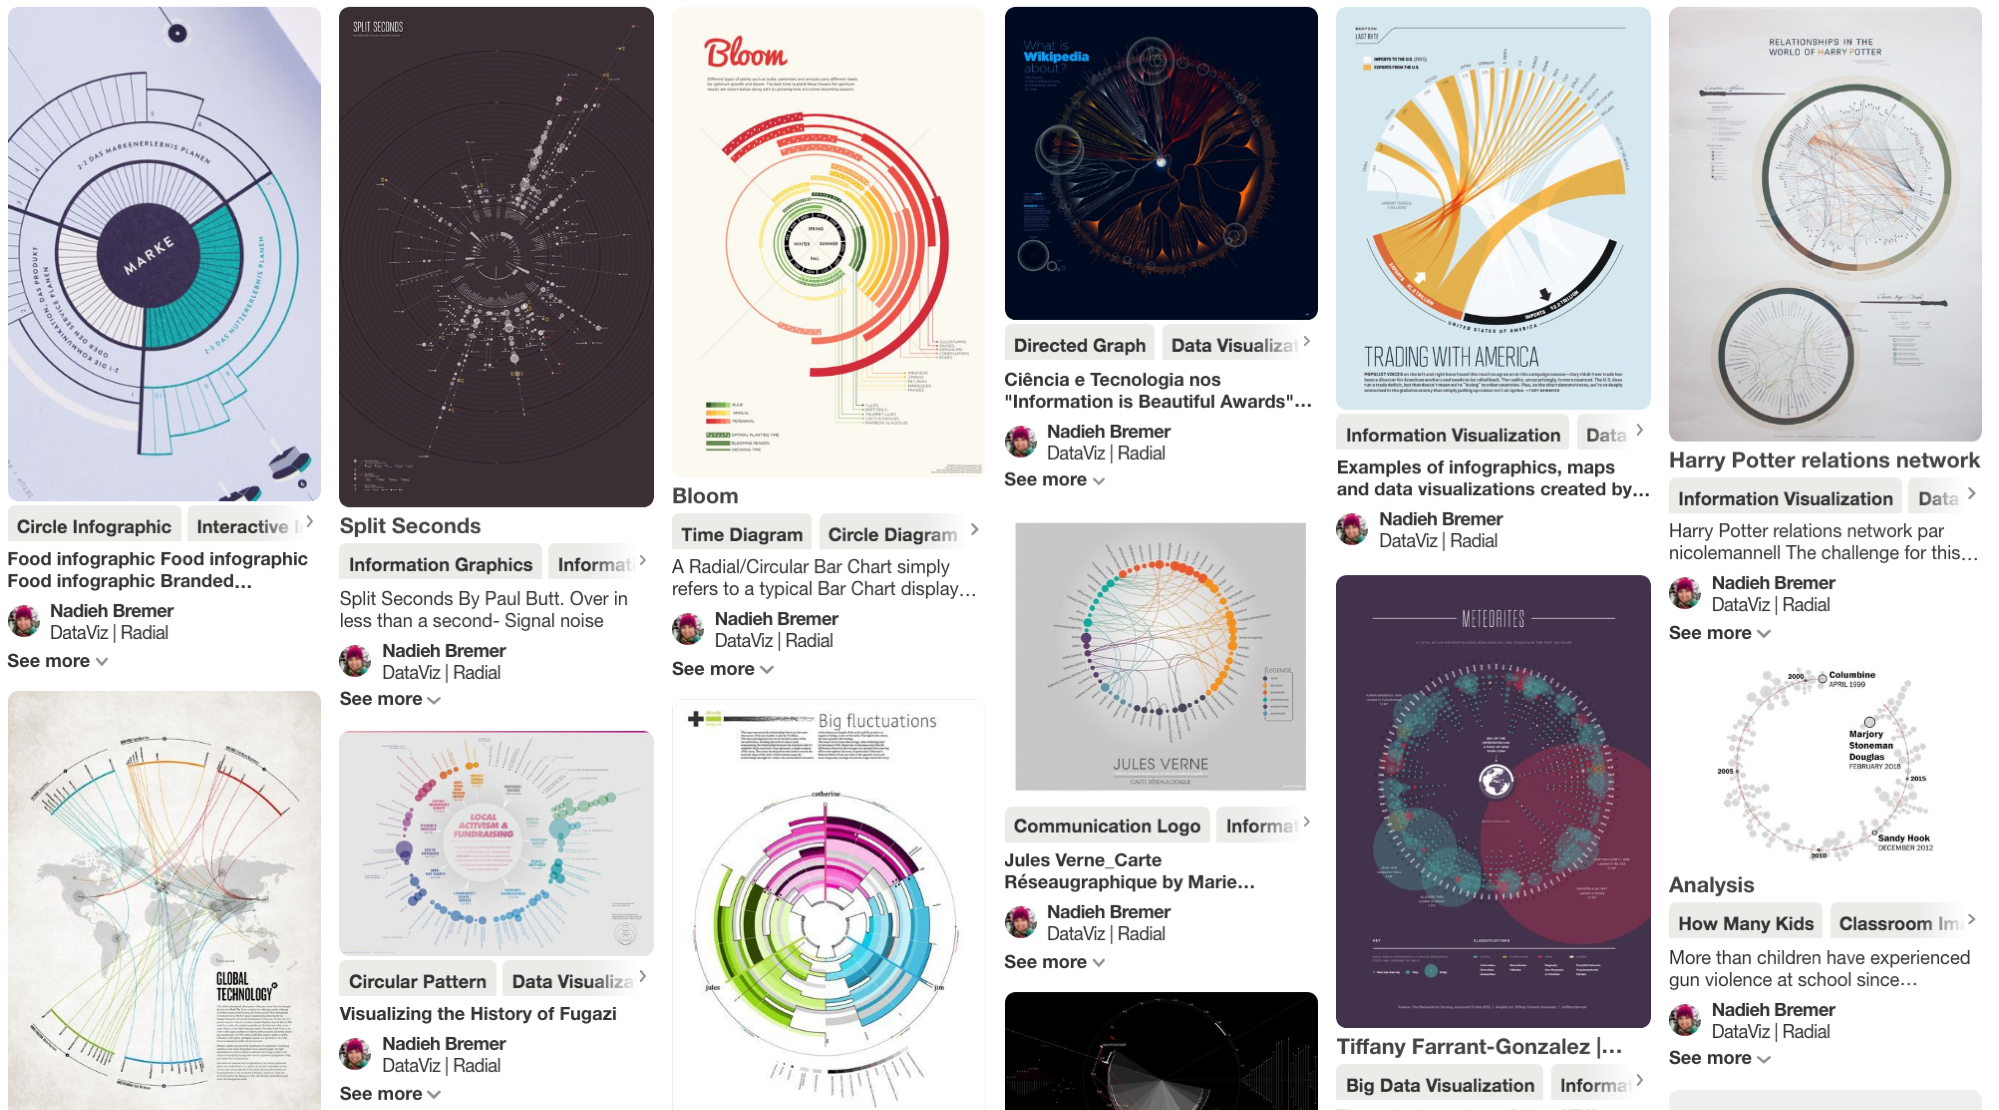 Sampling Nadieh Bremer's  Data Viz | Radial  collection on Pinterest